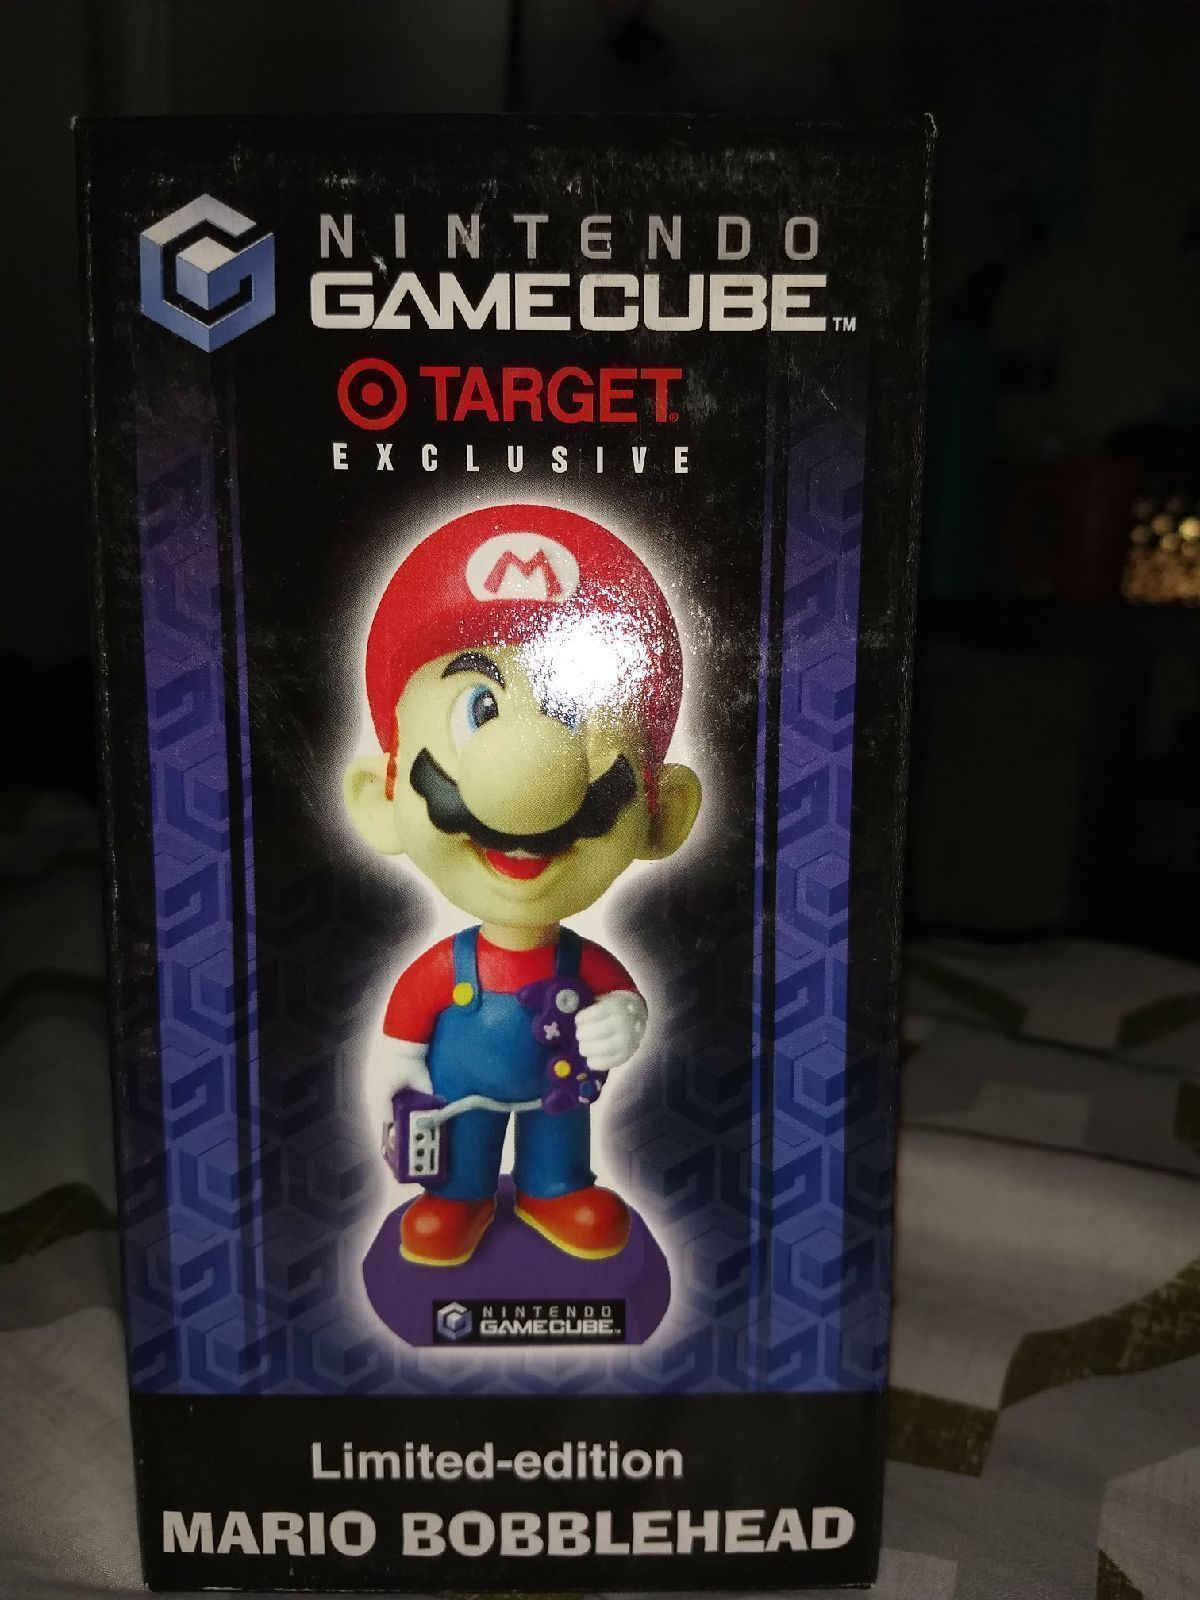 New Mario bobble head limited